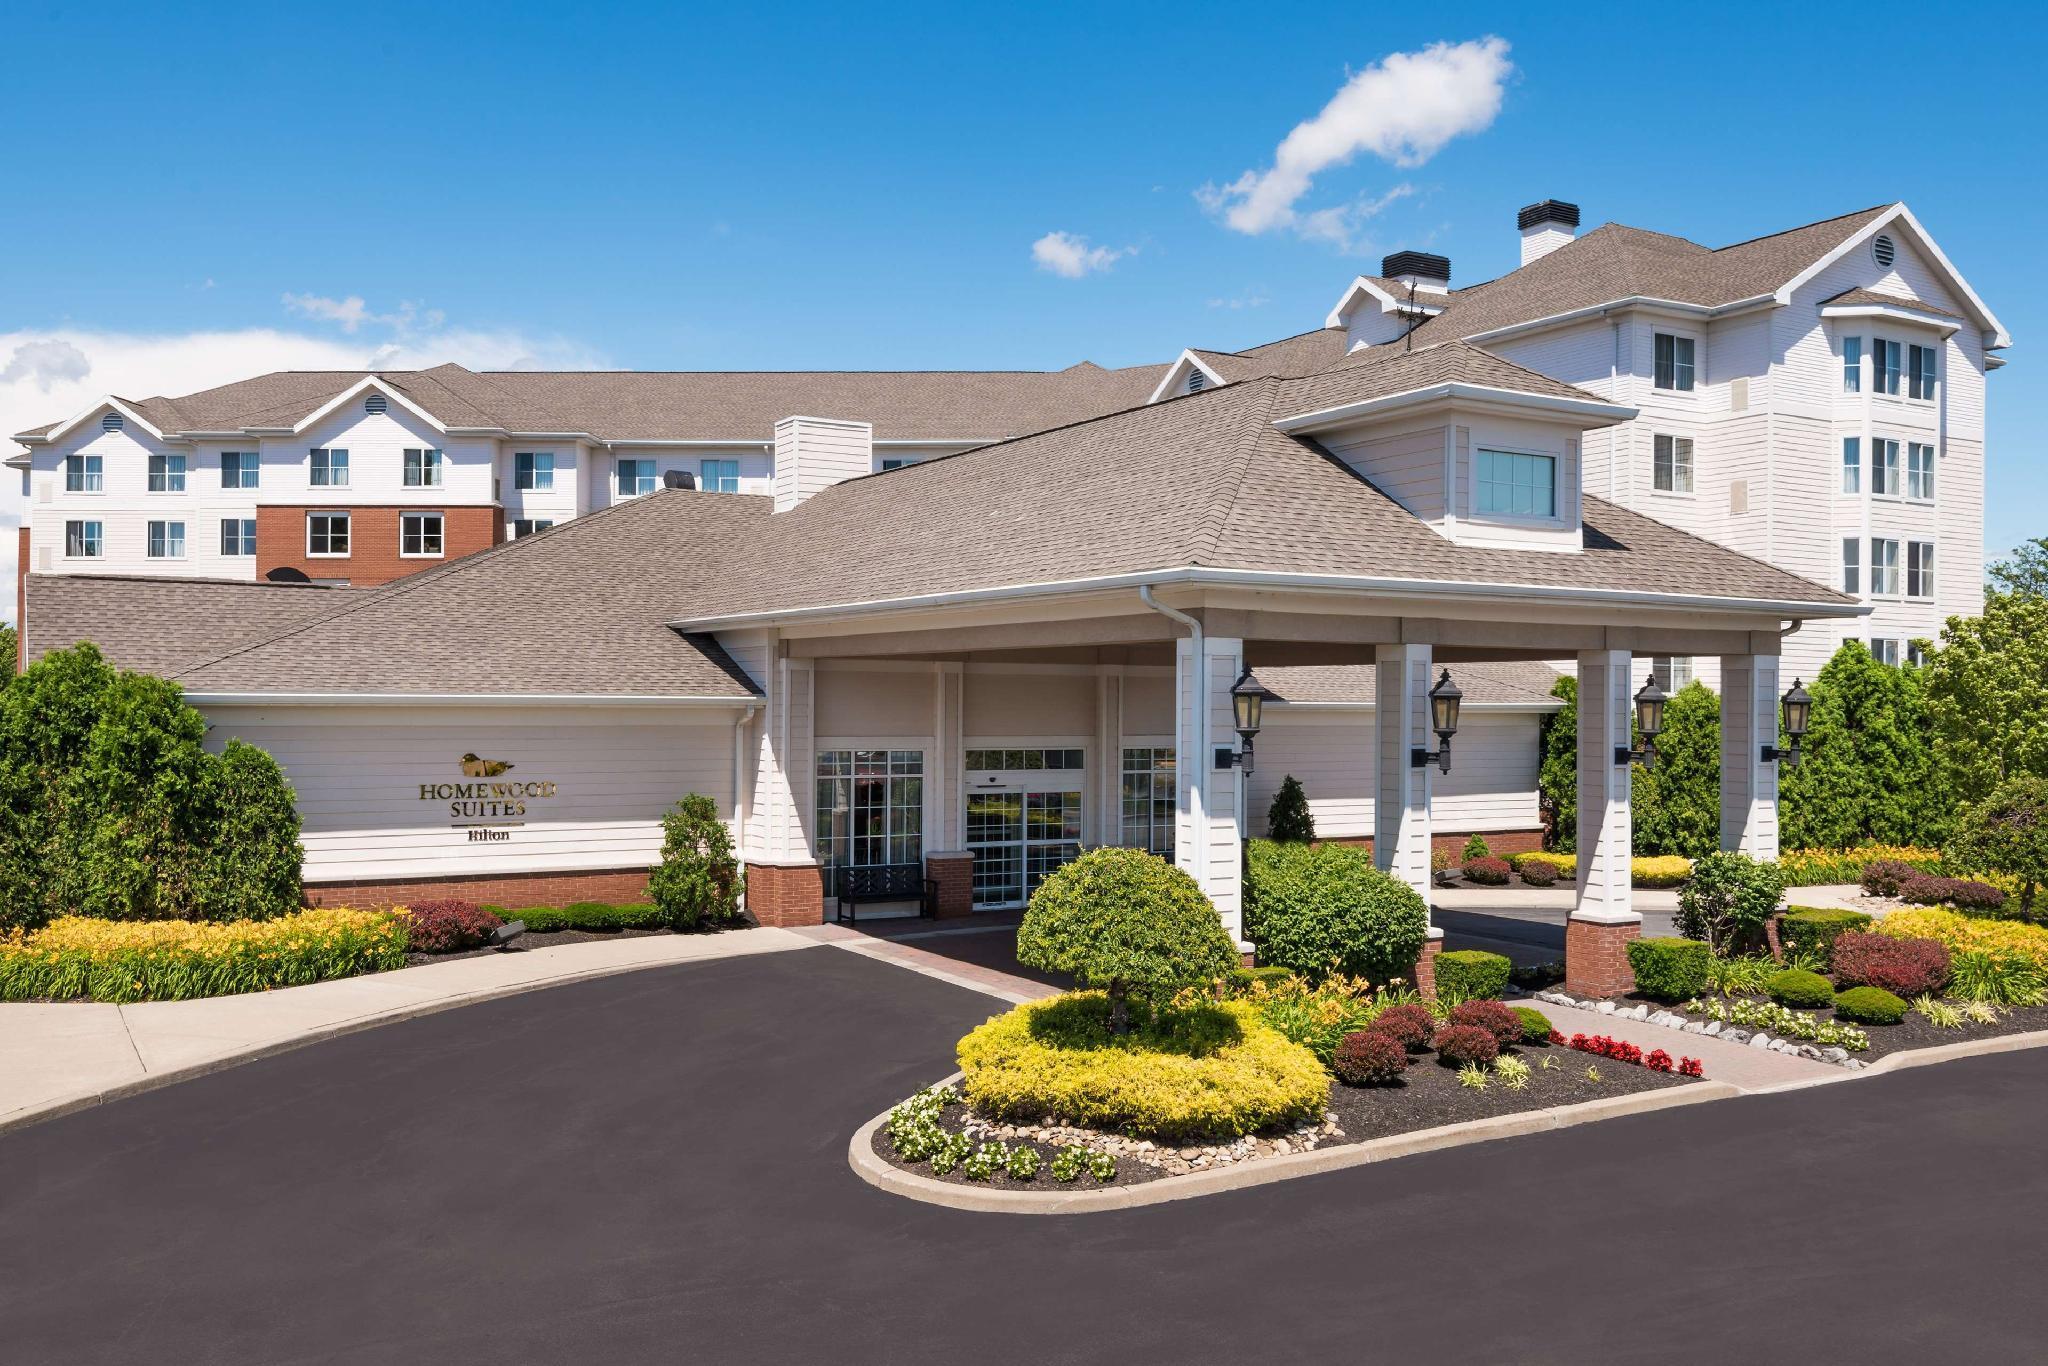 Homewood Suites By Hilton Buffalo Amherst Hotel